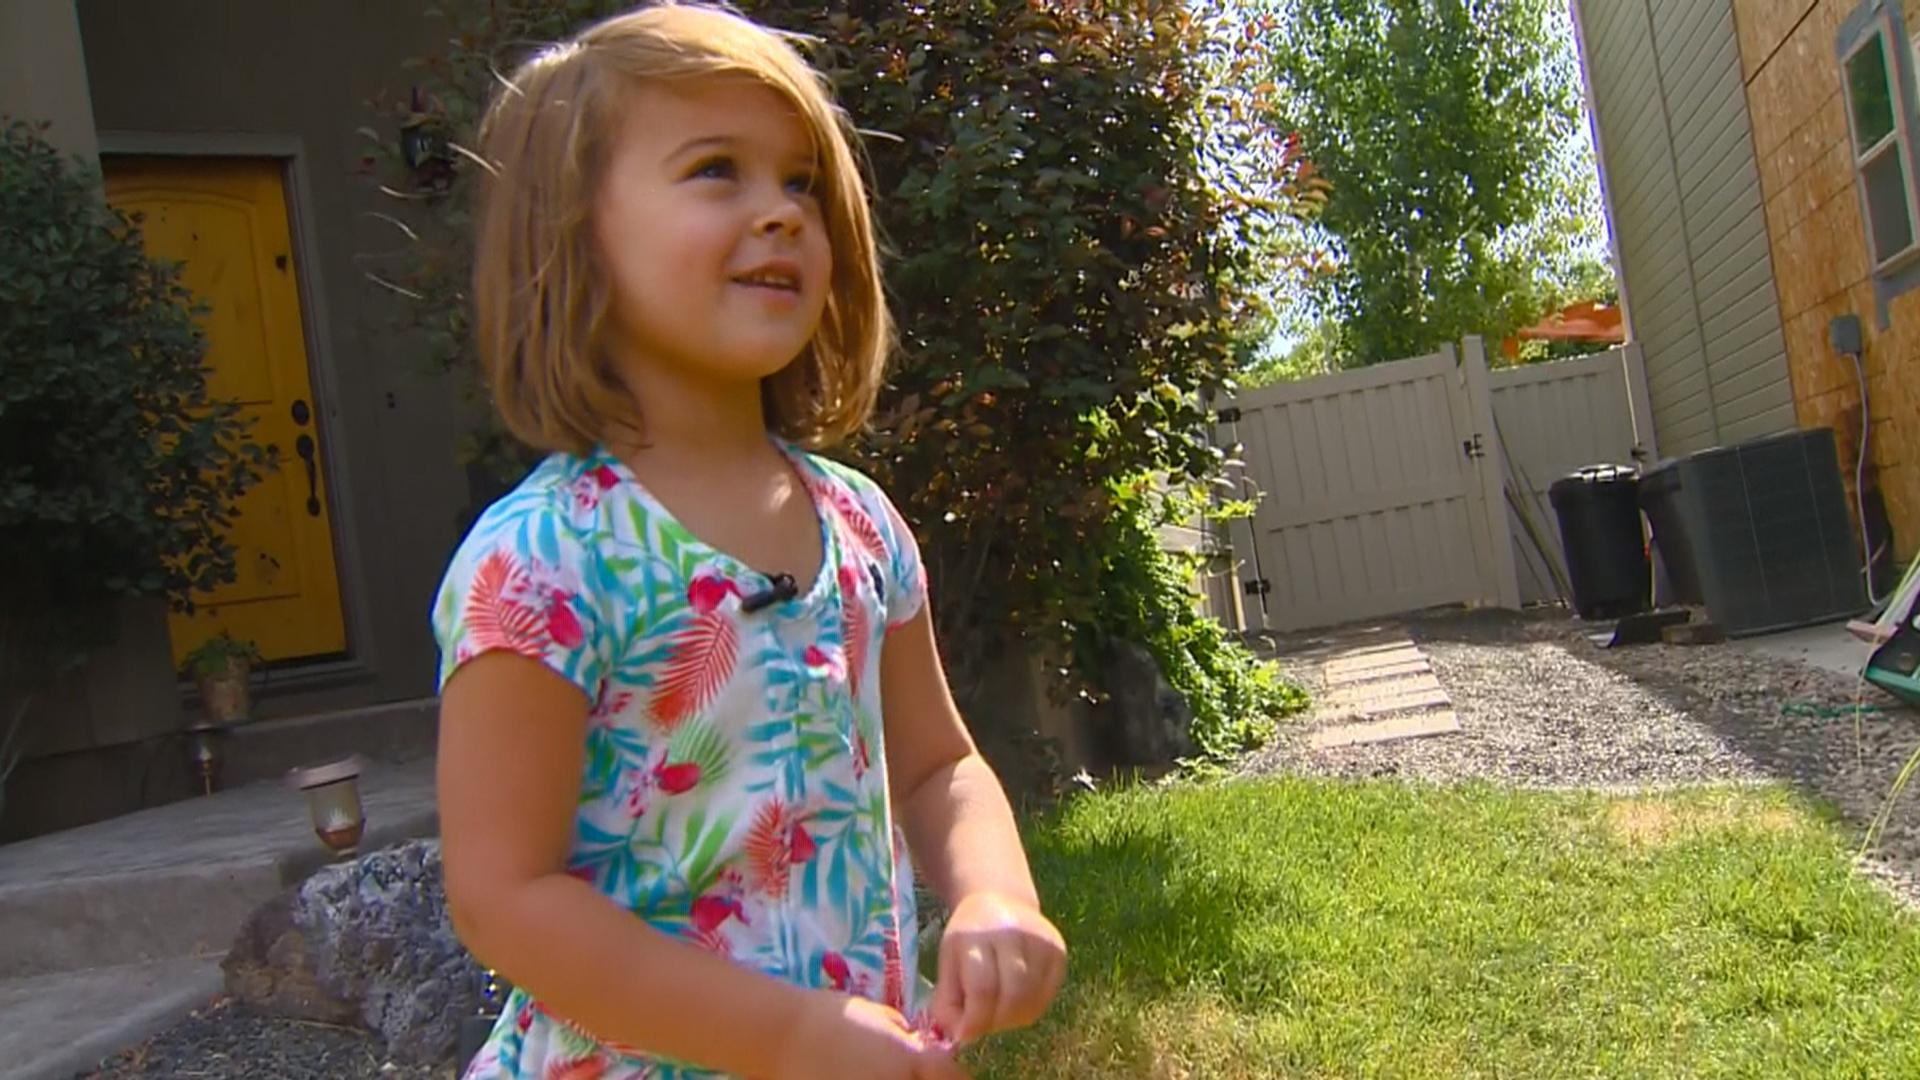 Idaho Girl Rosie Moran Spots House Fire, Helps Save Family